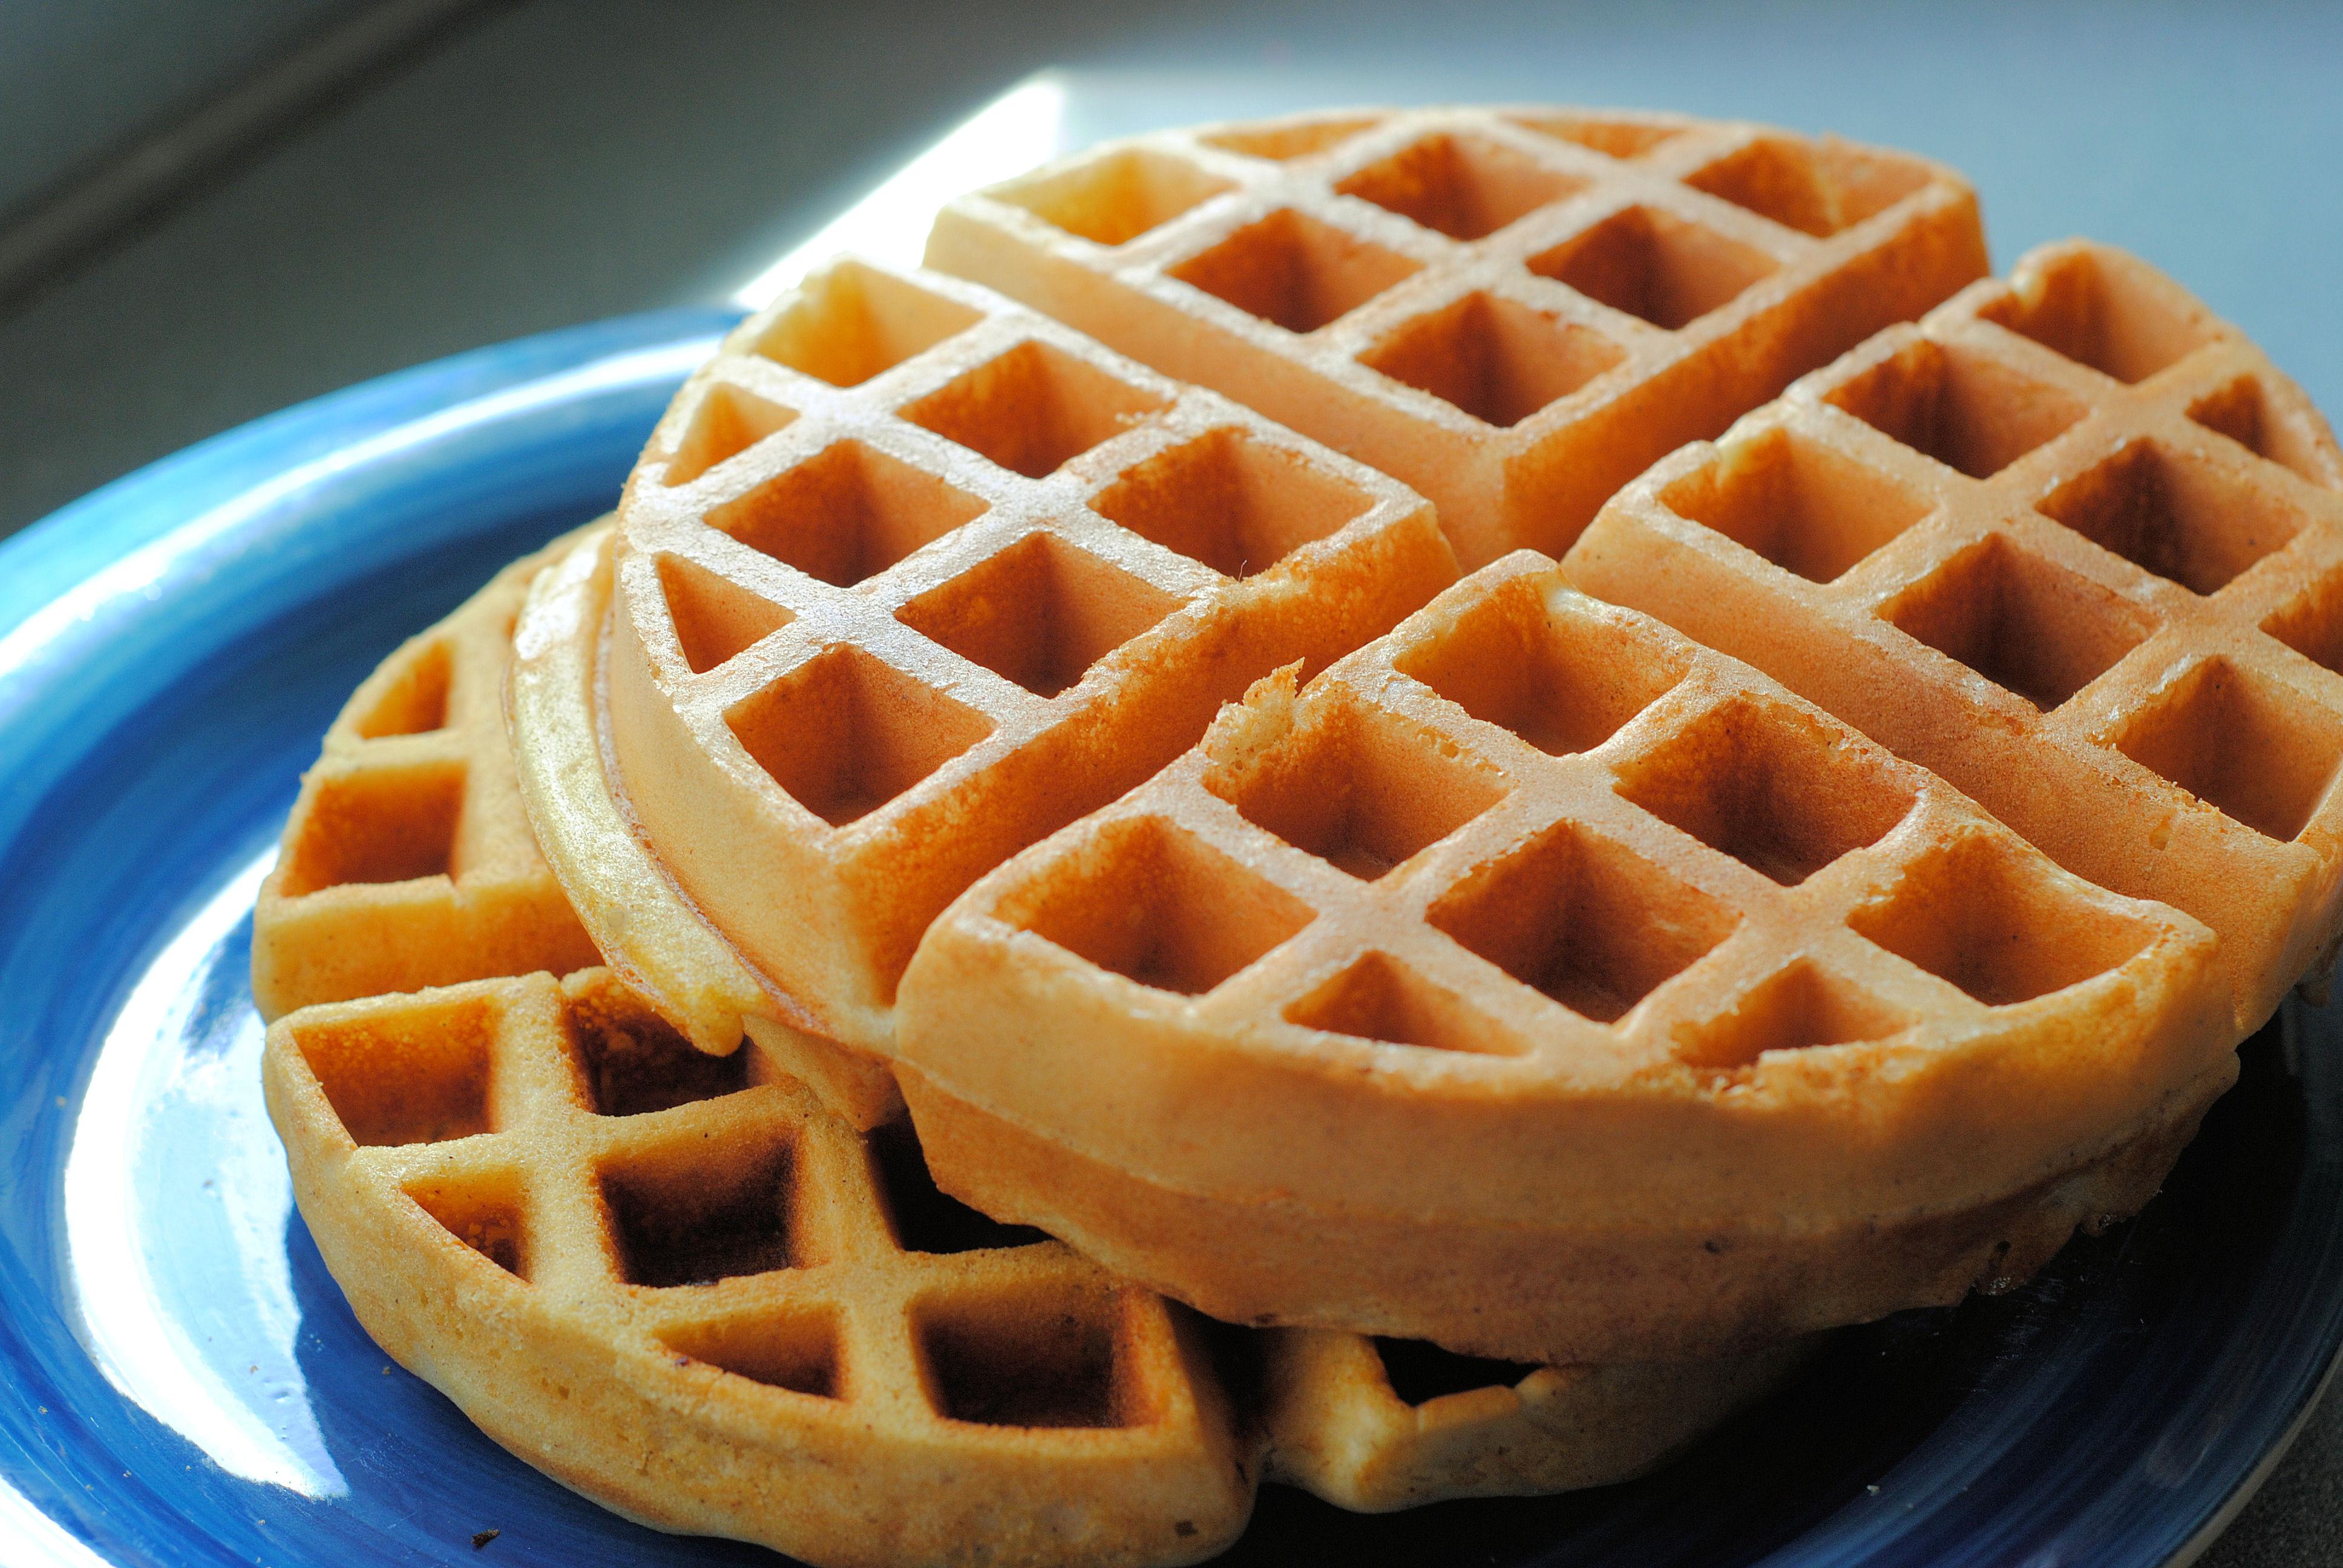 rofl-waffle - FIMFiction.net